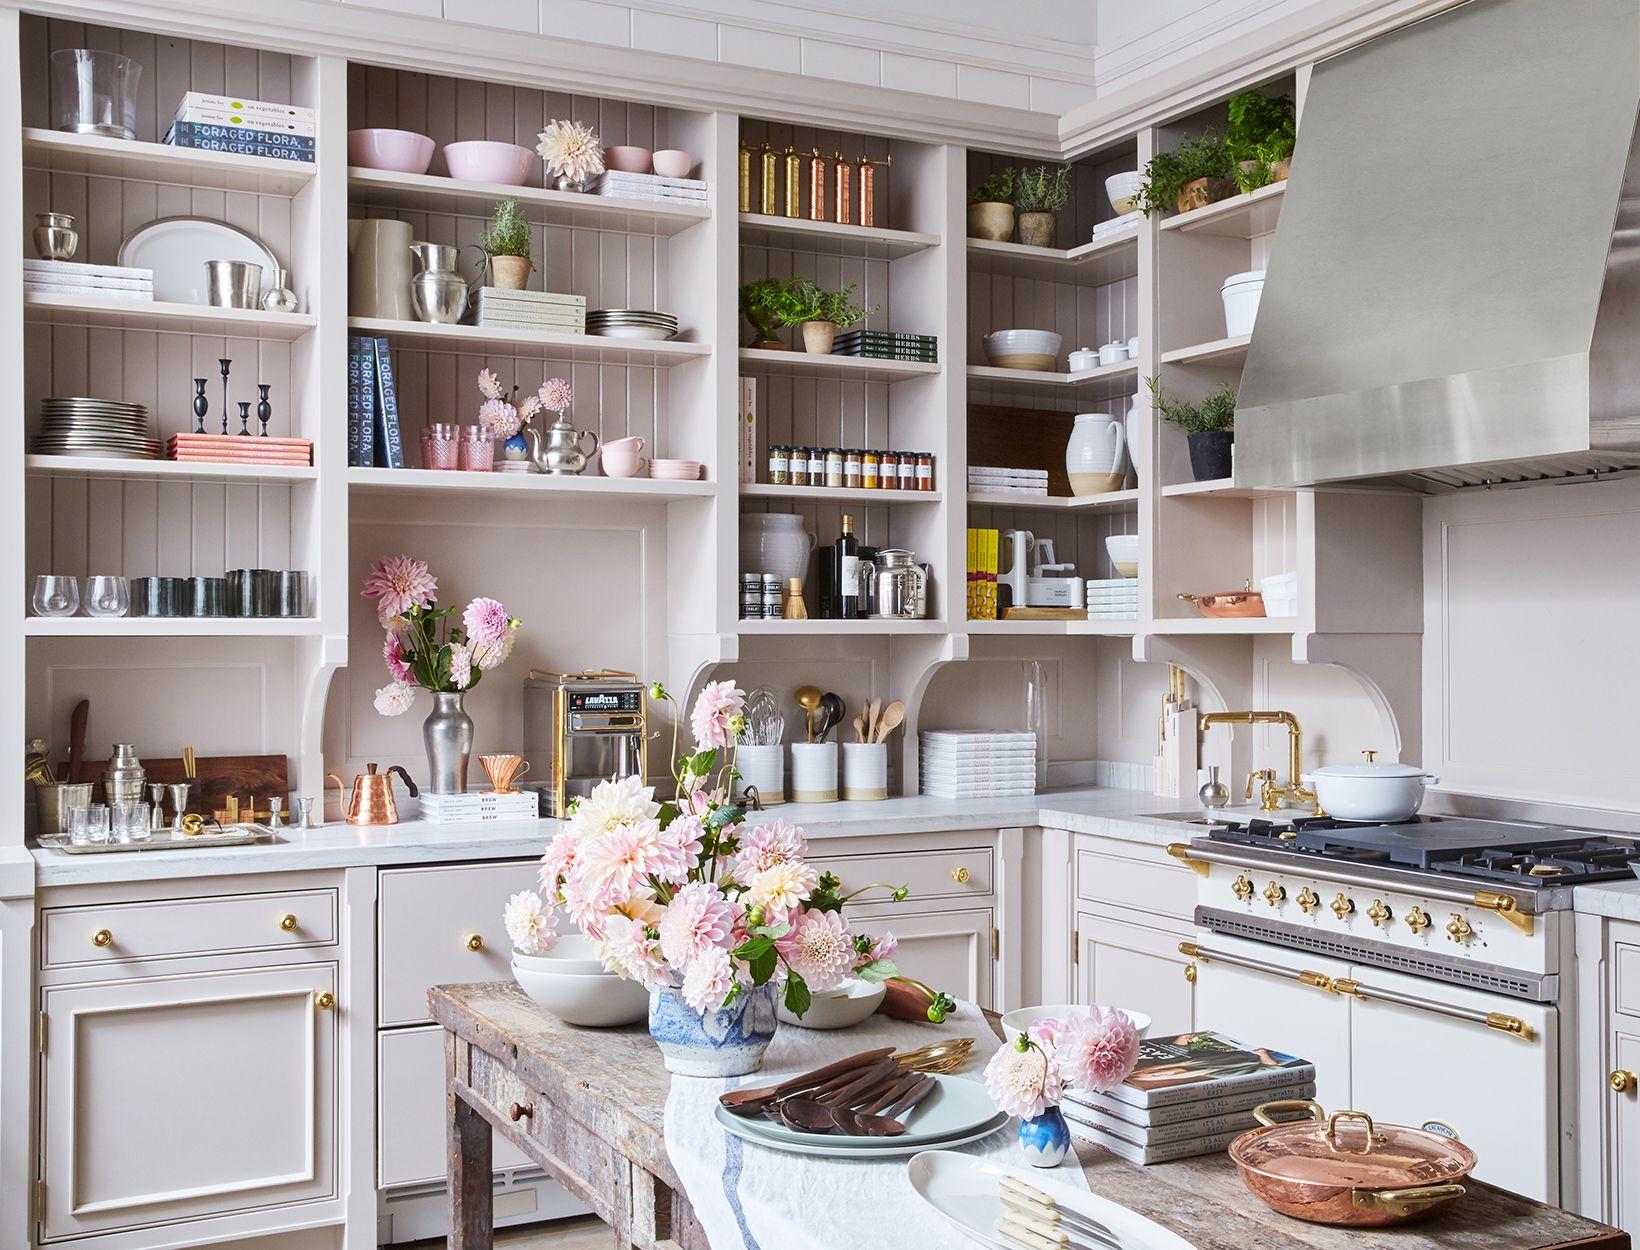 Goop opens permanent shop gwyneth paltrow lifestyle brand